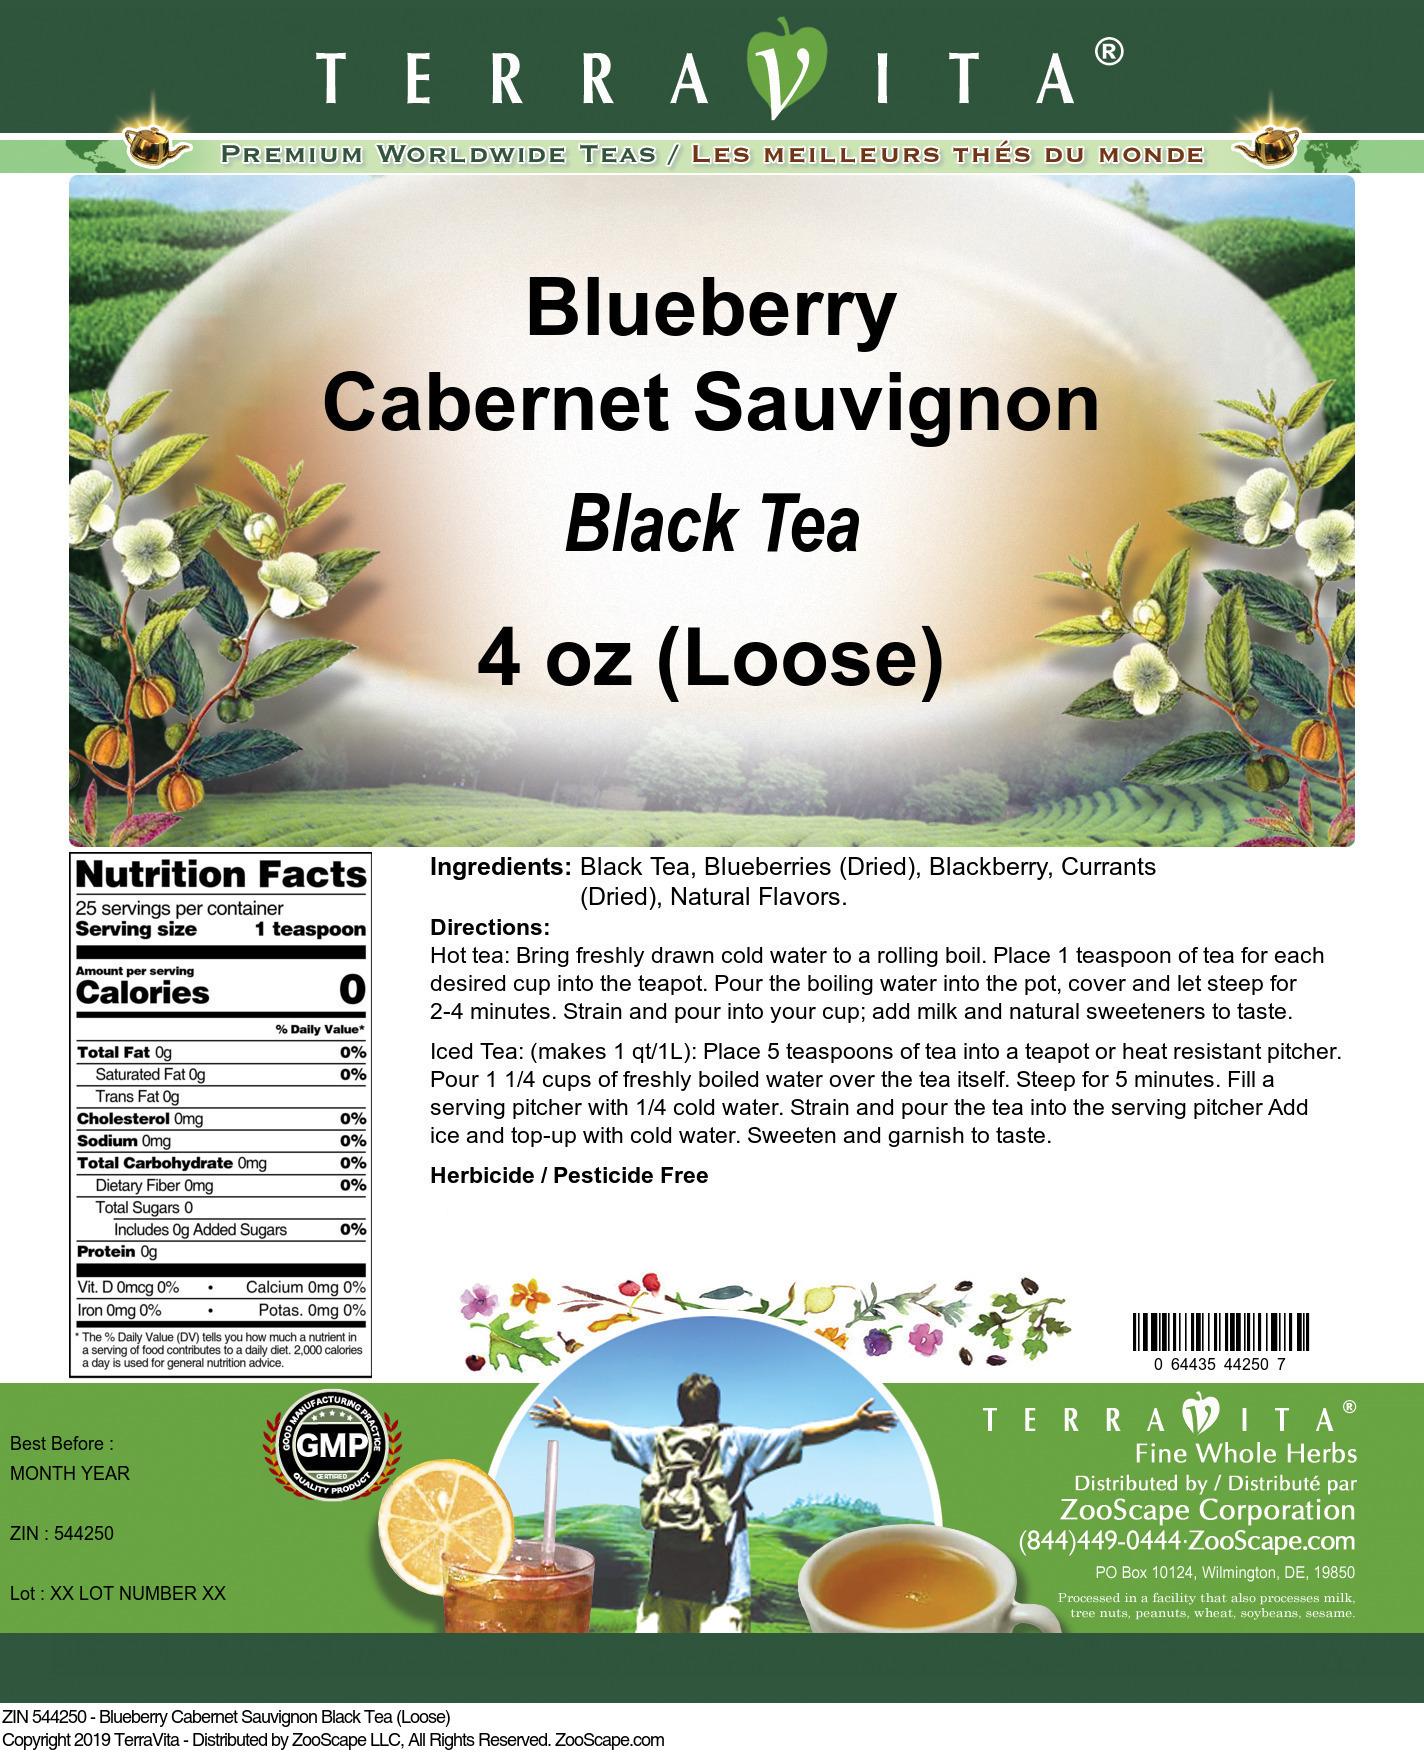 Blueberry Cabernet Sauvignon Black Tea